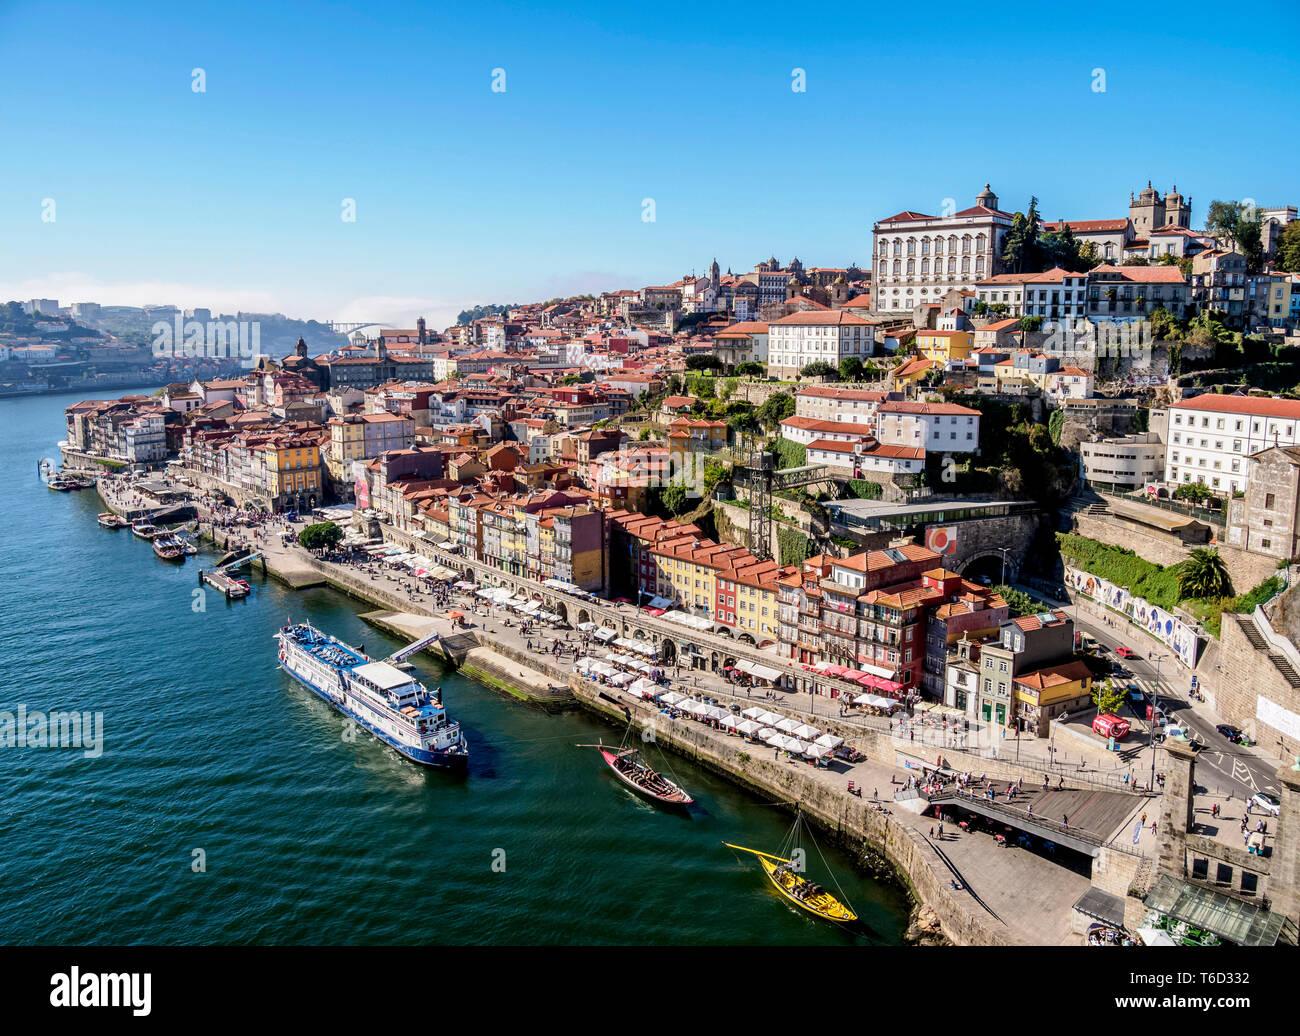 Douro River and Cityscape of Porto, elevated view, Portugal - Stock Image